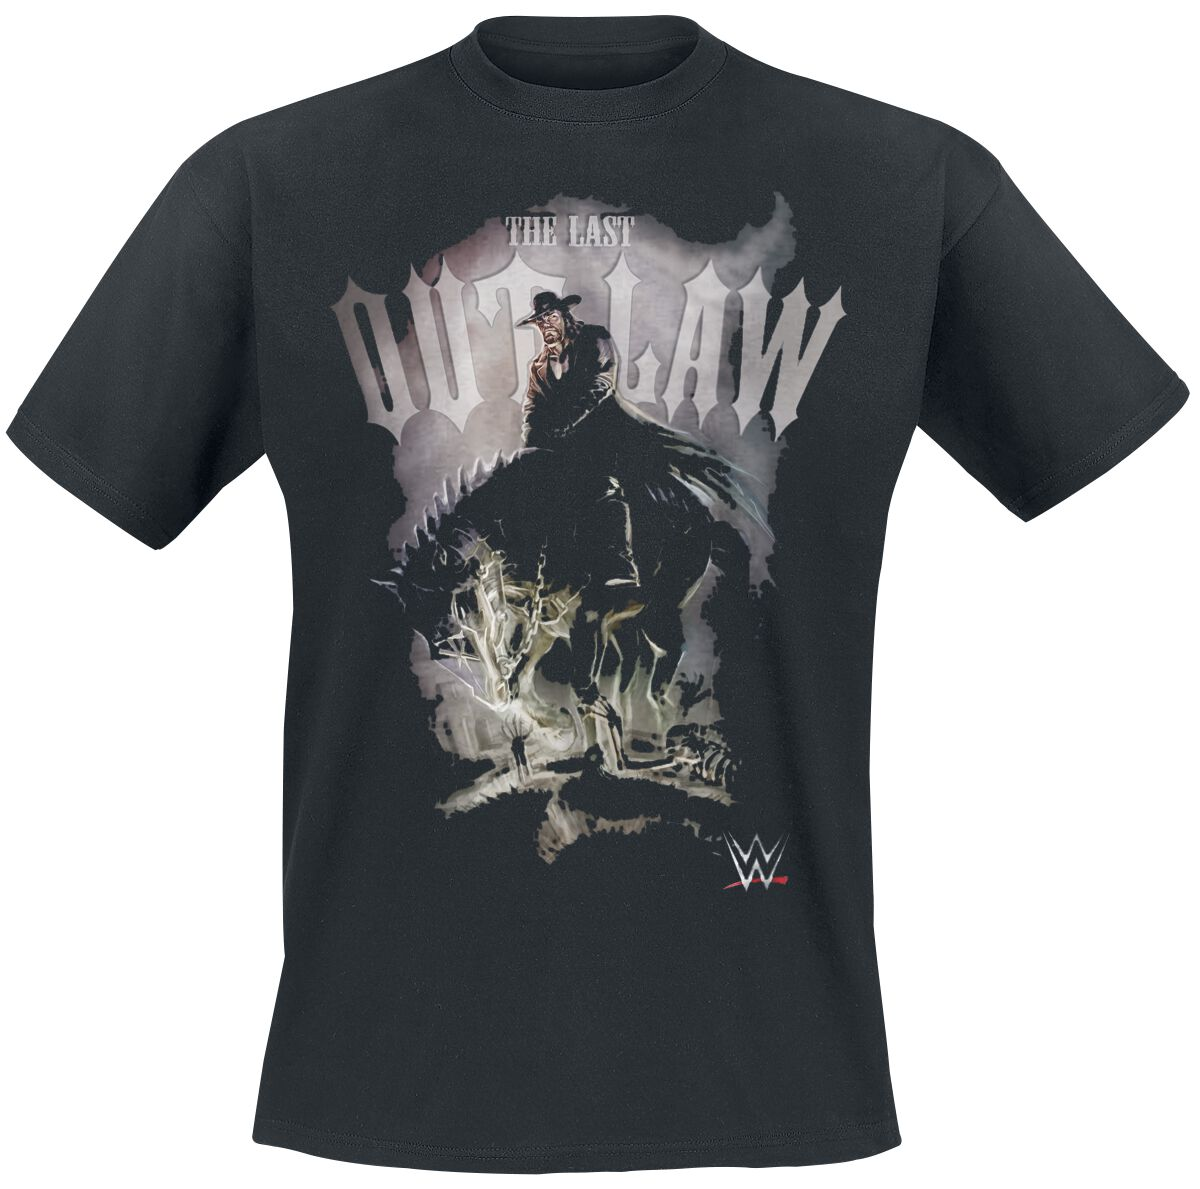 Merch dla Fanów - Koszulki - T-Shirt WWE The Undertaker - The Last Outlaw T-Shirt czarny - 376826